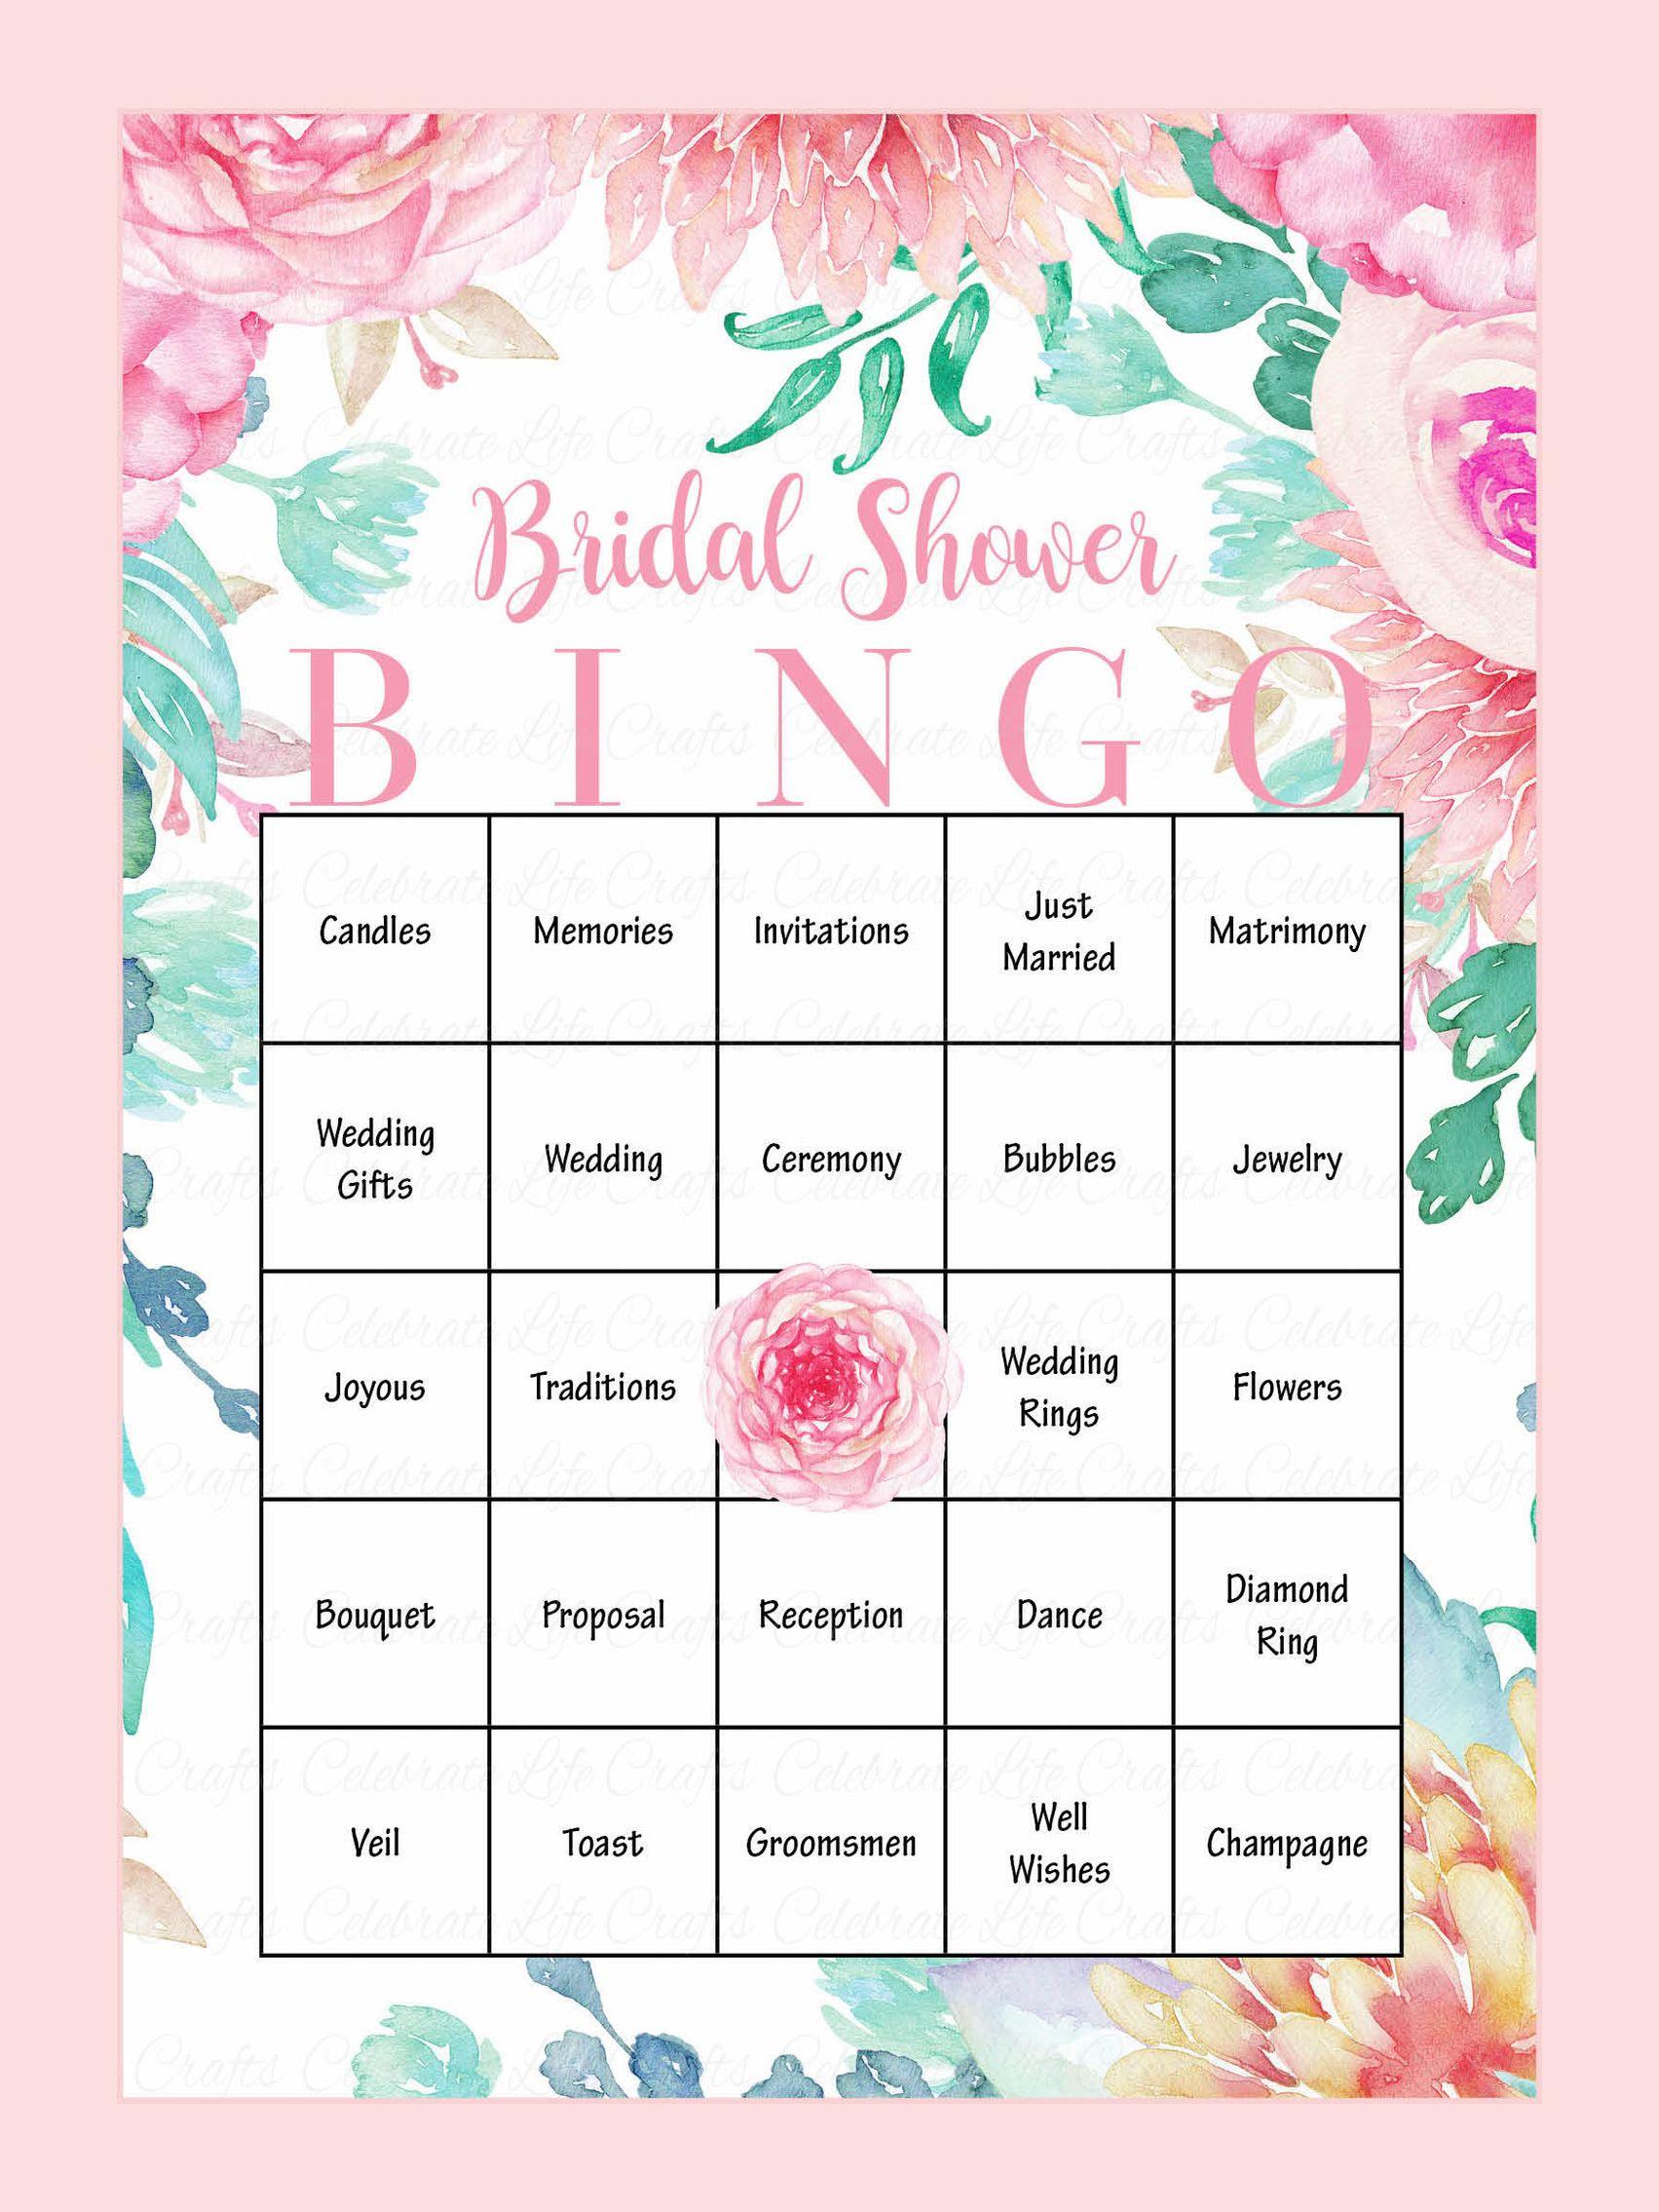 Printable Bridal Shower Bingo Cards | Bridal Showers | Bridal Shower - Free Printable Bridal Shower Bingo